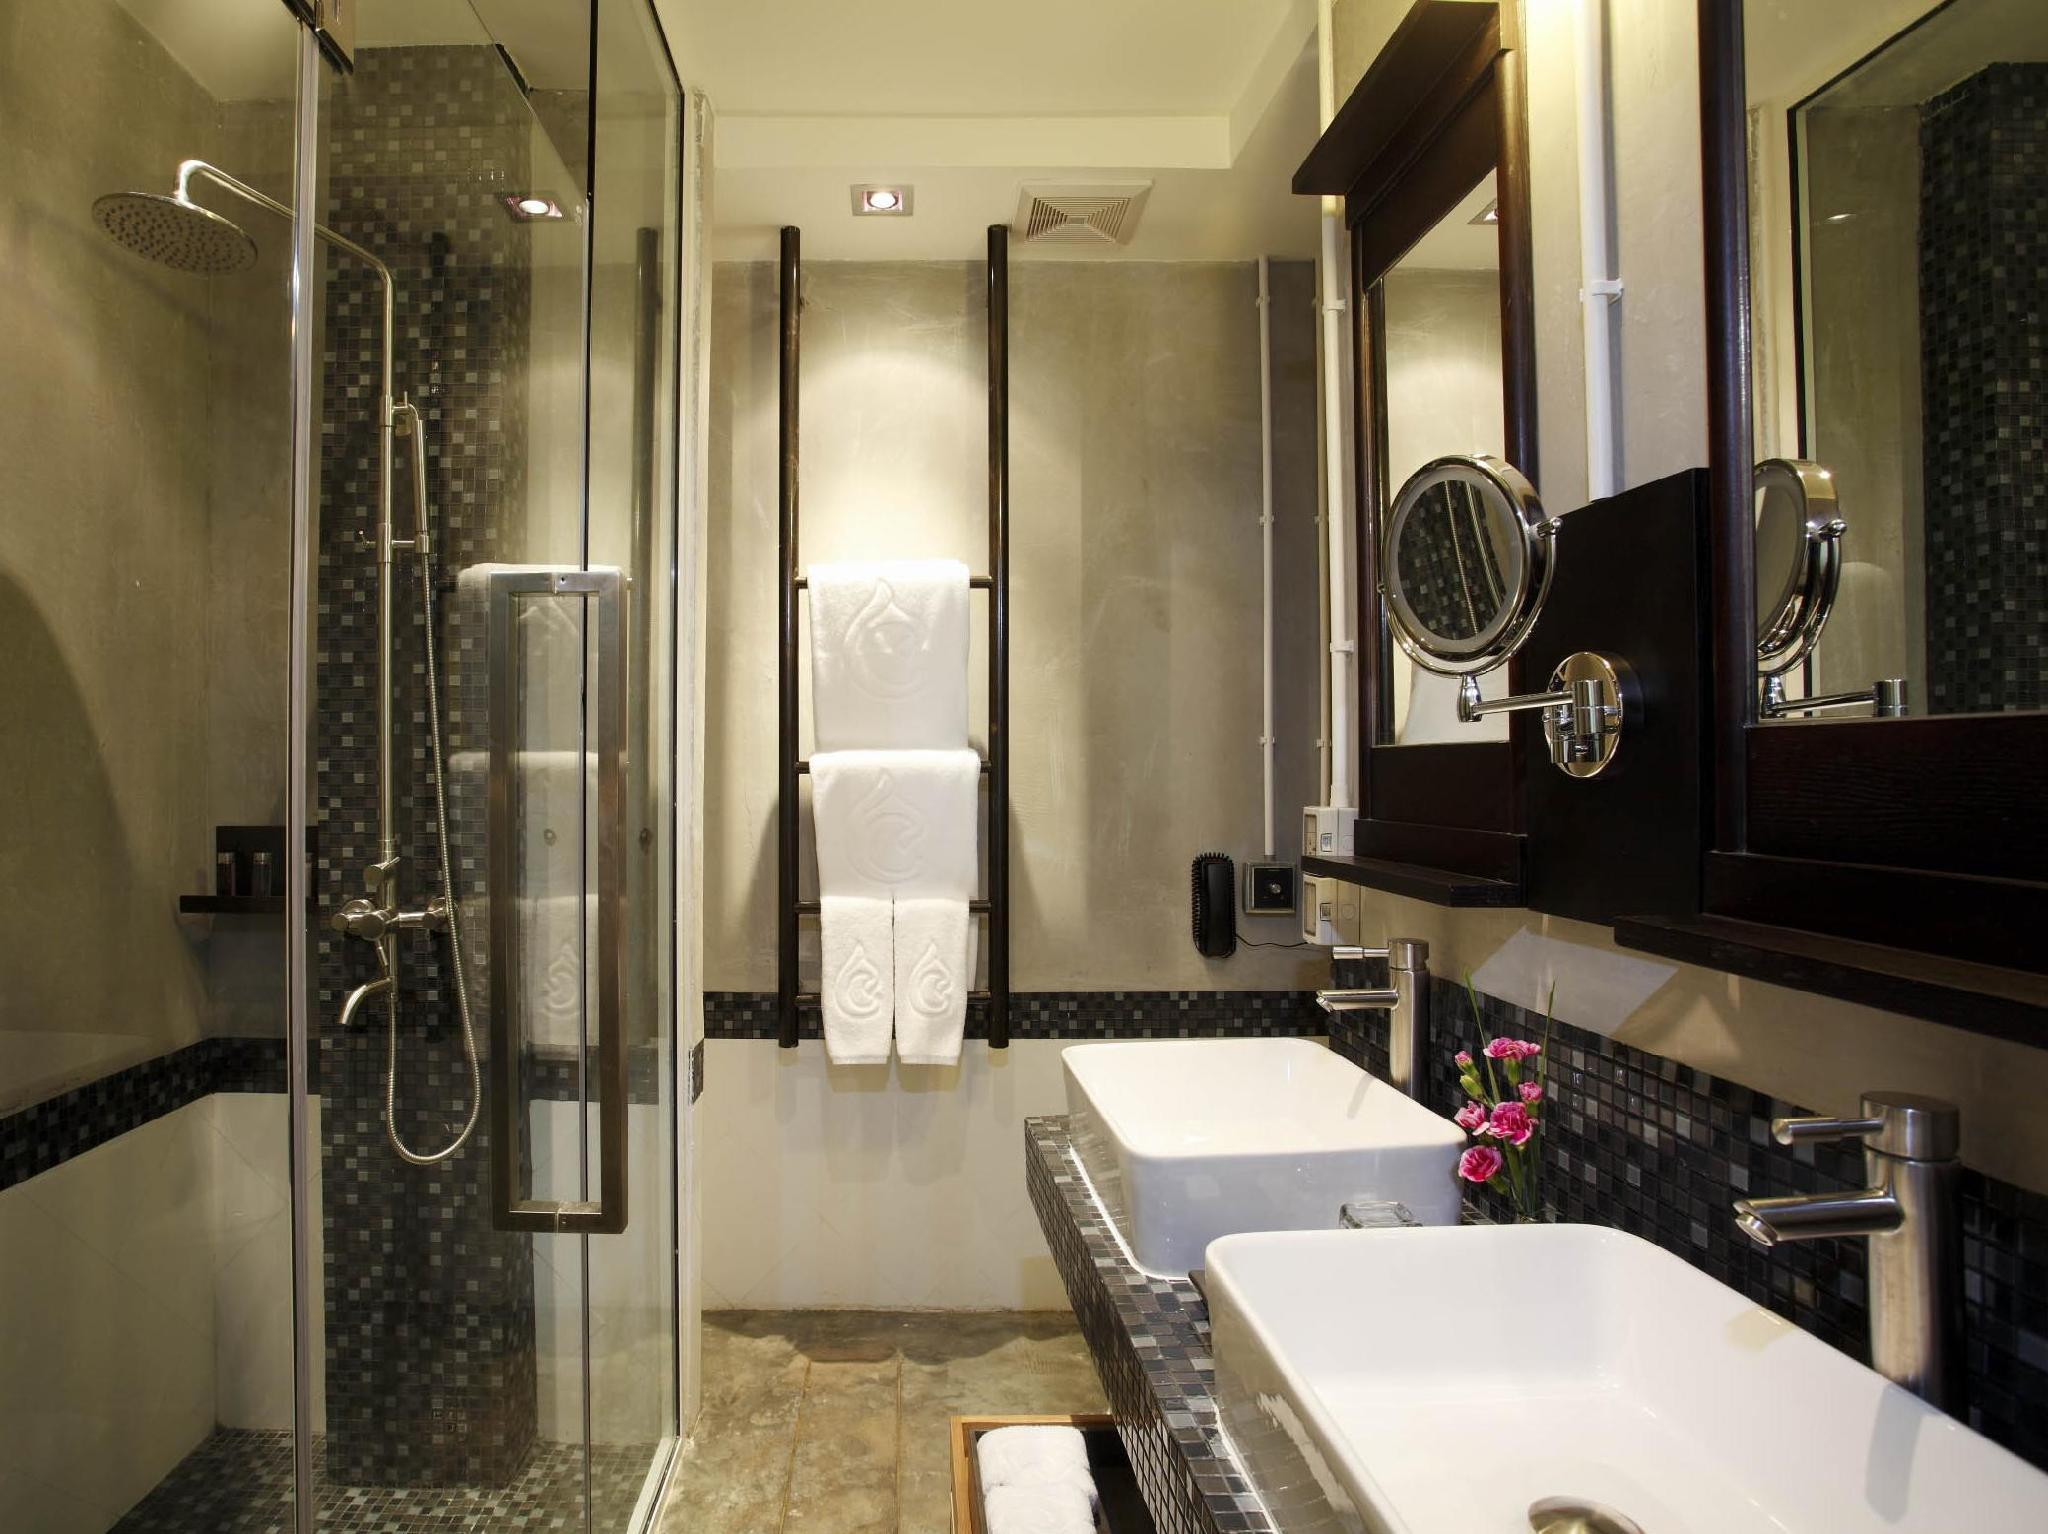 MD Resort Pattaya,เอ็มดี รีสอร์ต พัทยา